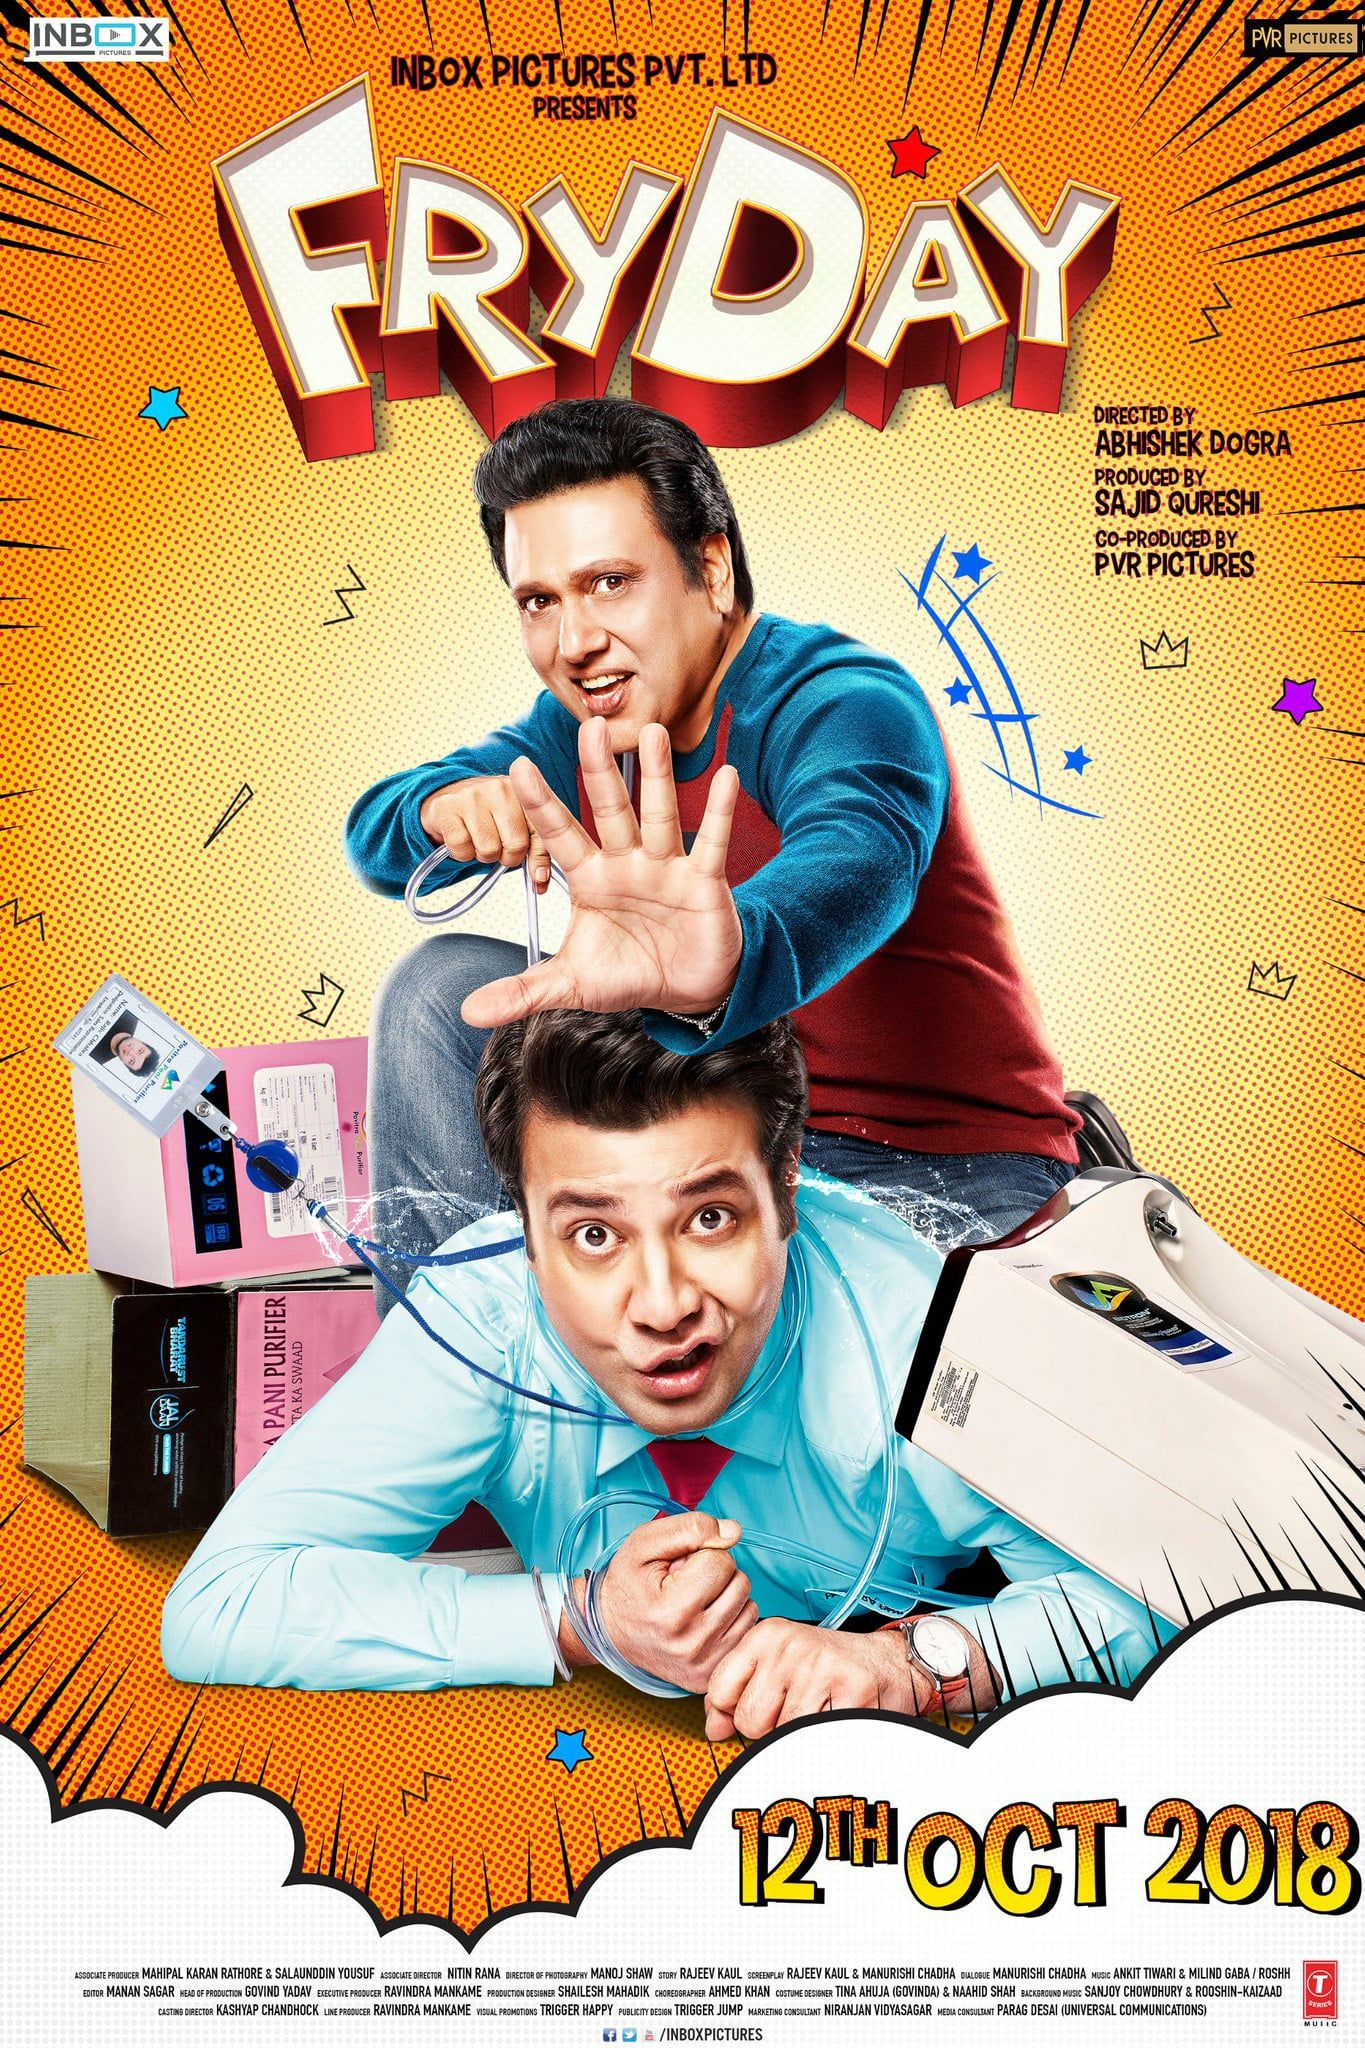 online hindi movie sanju